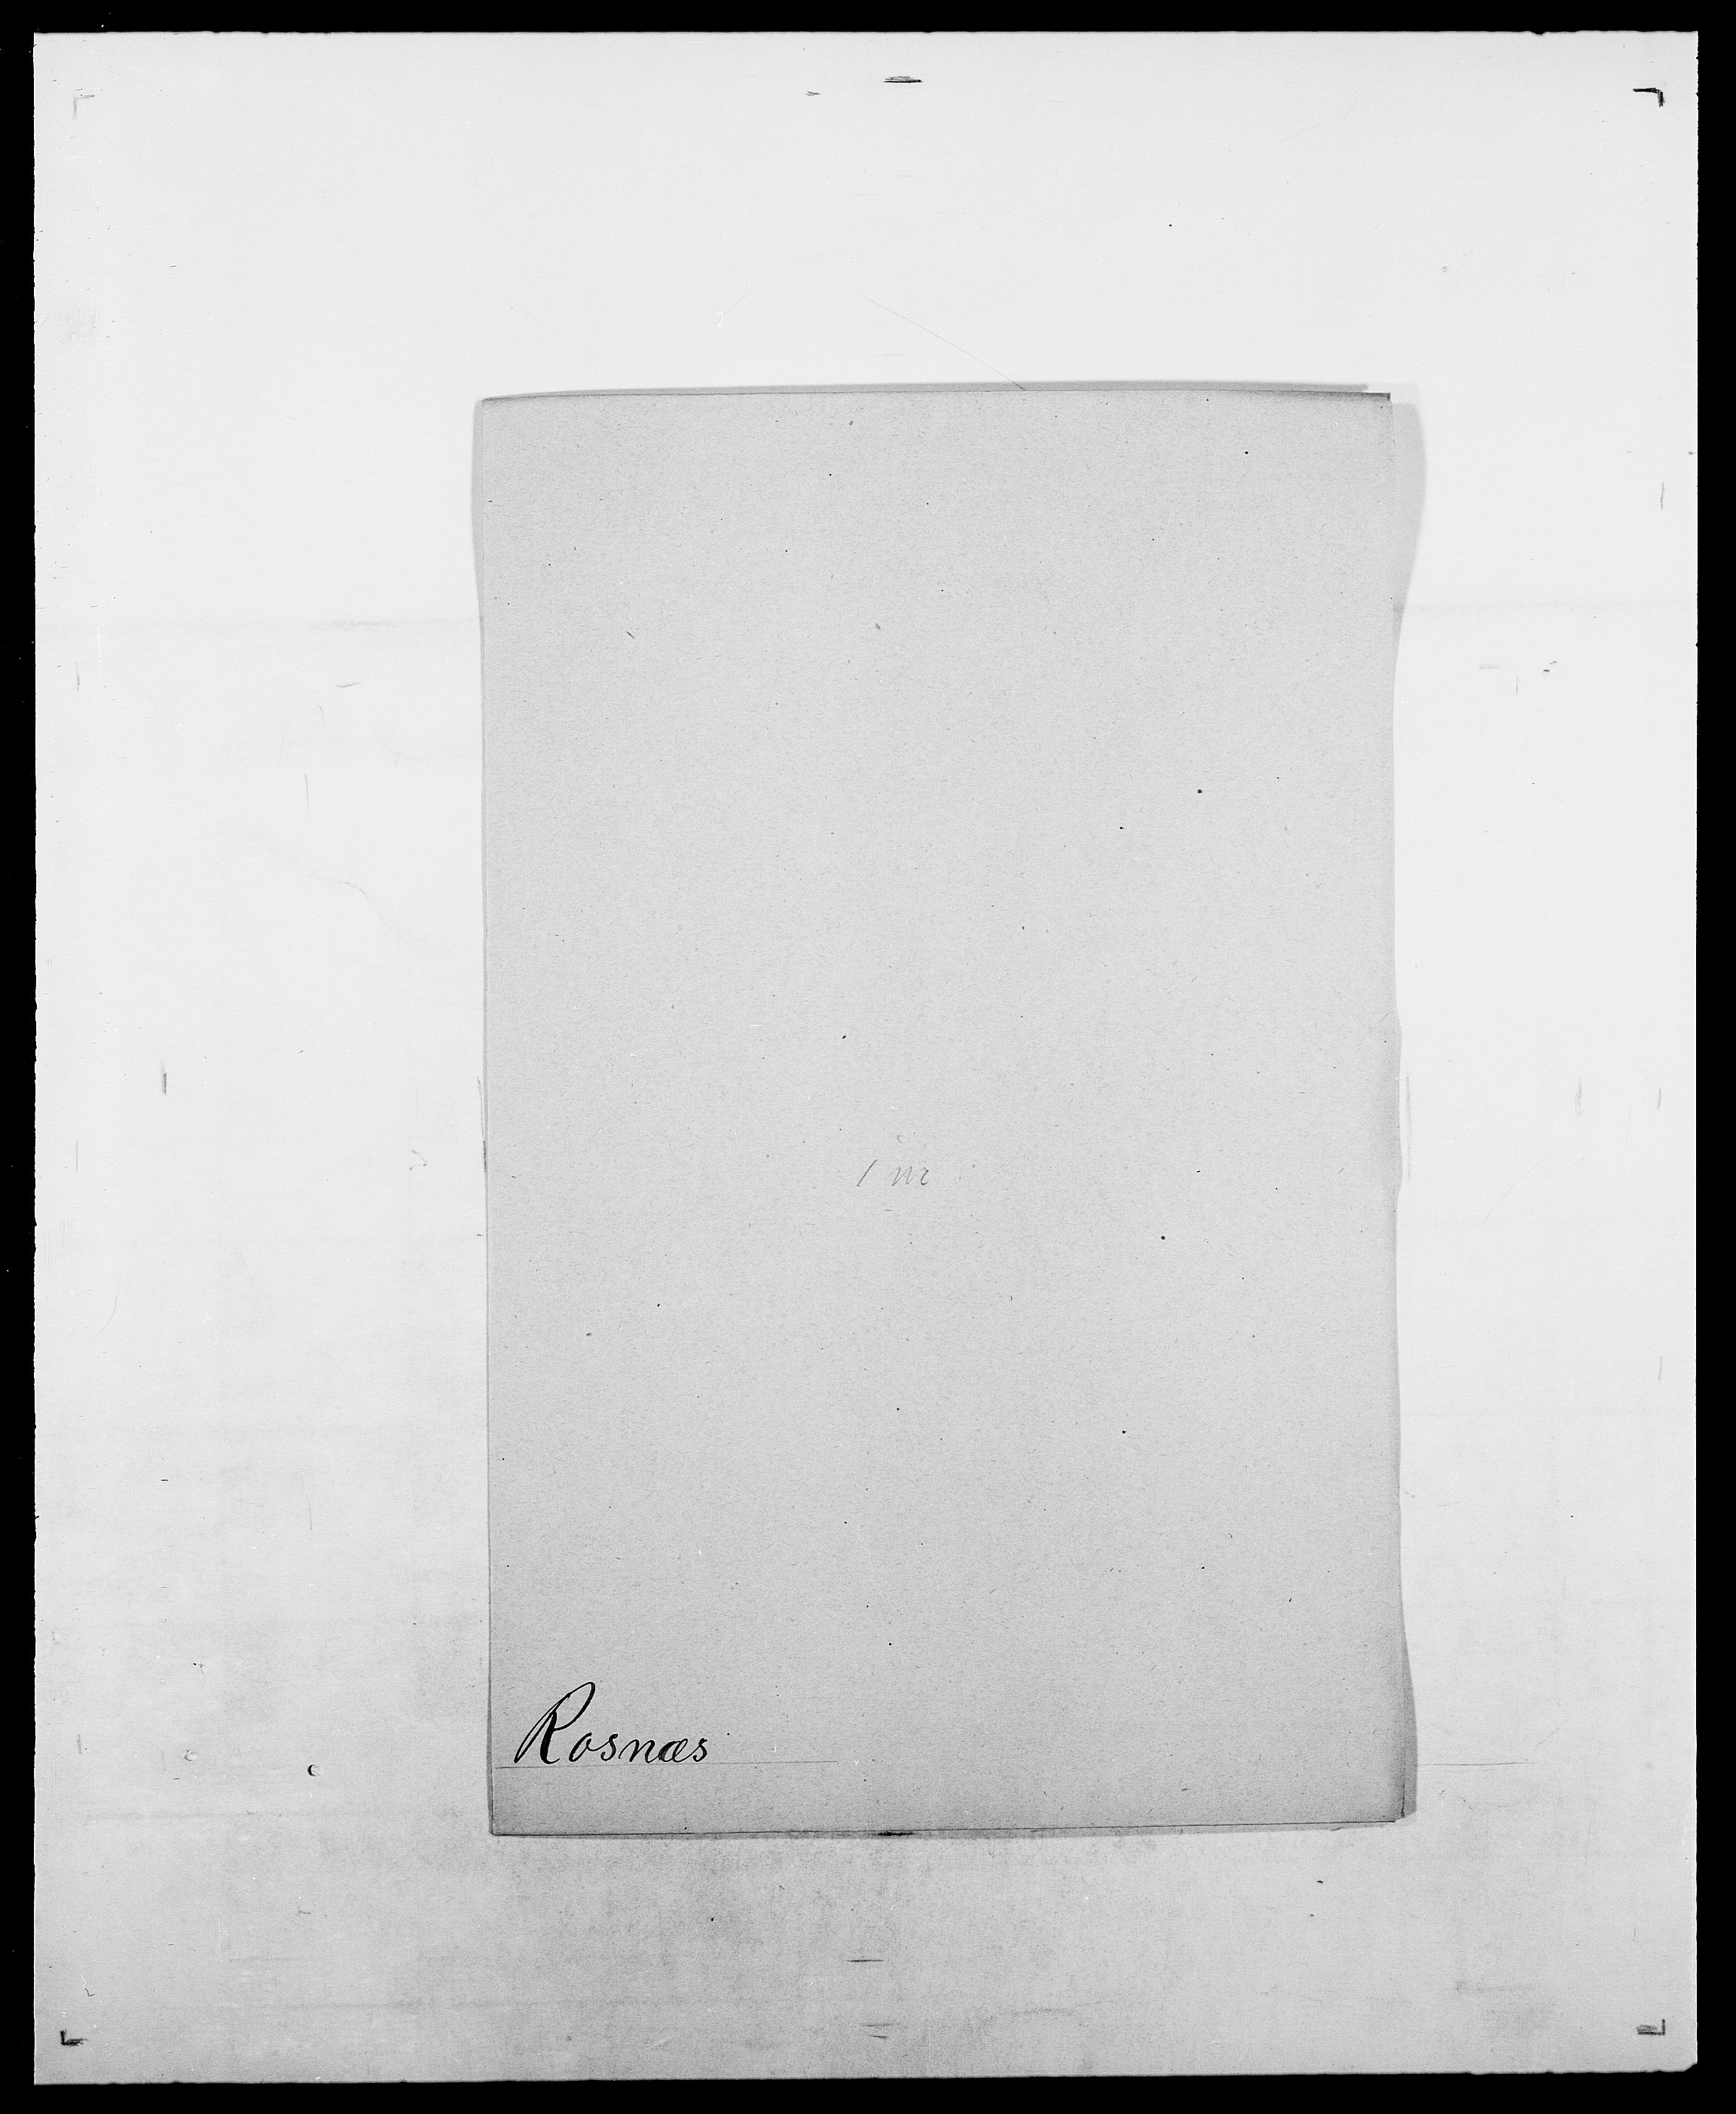 SAO, Delgobe, Charles Antoine - samling, D/Da/L0033: Roald - Røyem, s. 336